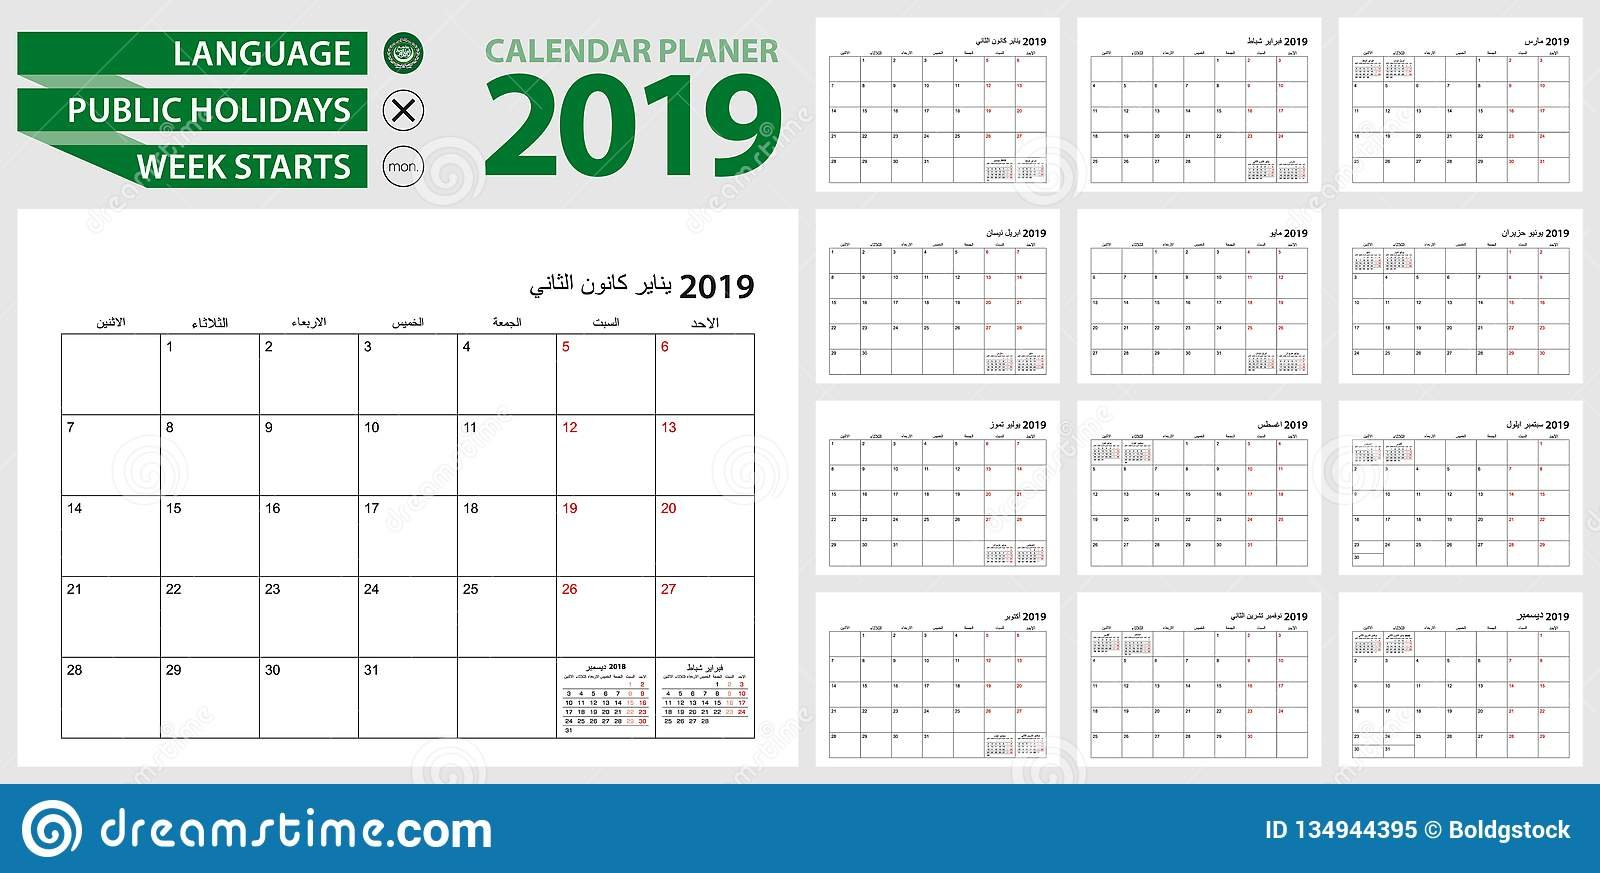 Arabic Calendar Planner For 2019. Arabic Language, Week Starts From Calendar 2019 Ksa